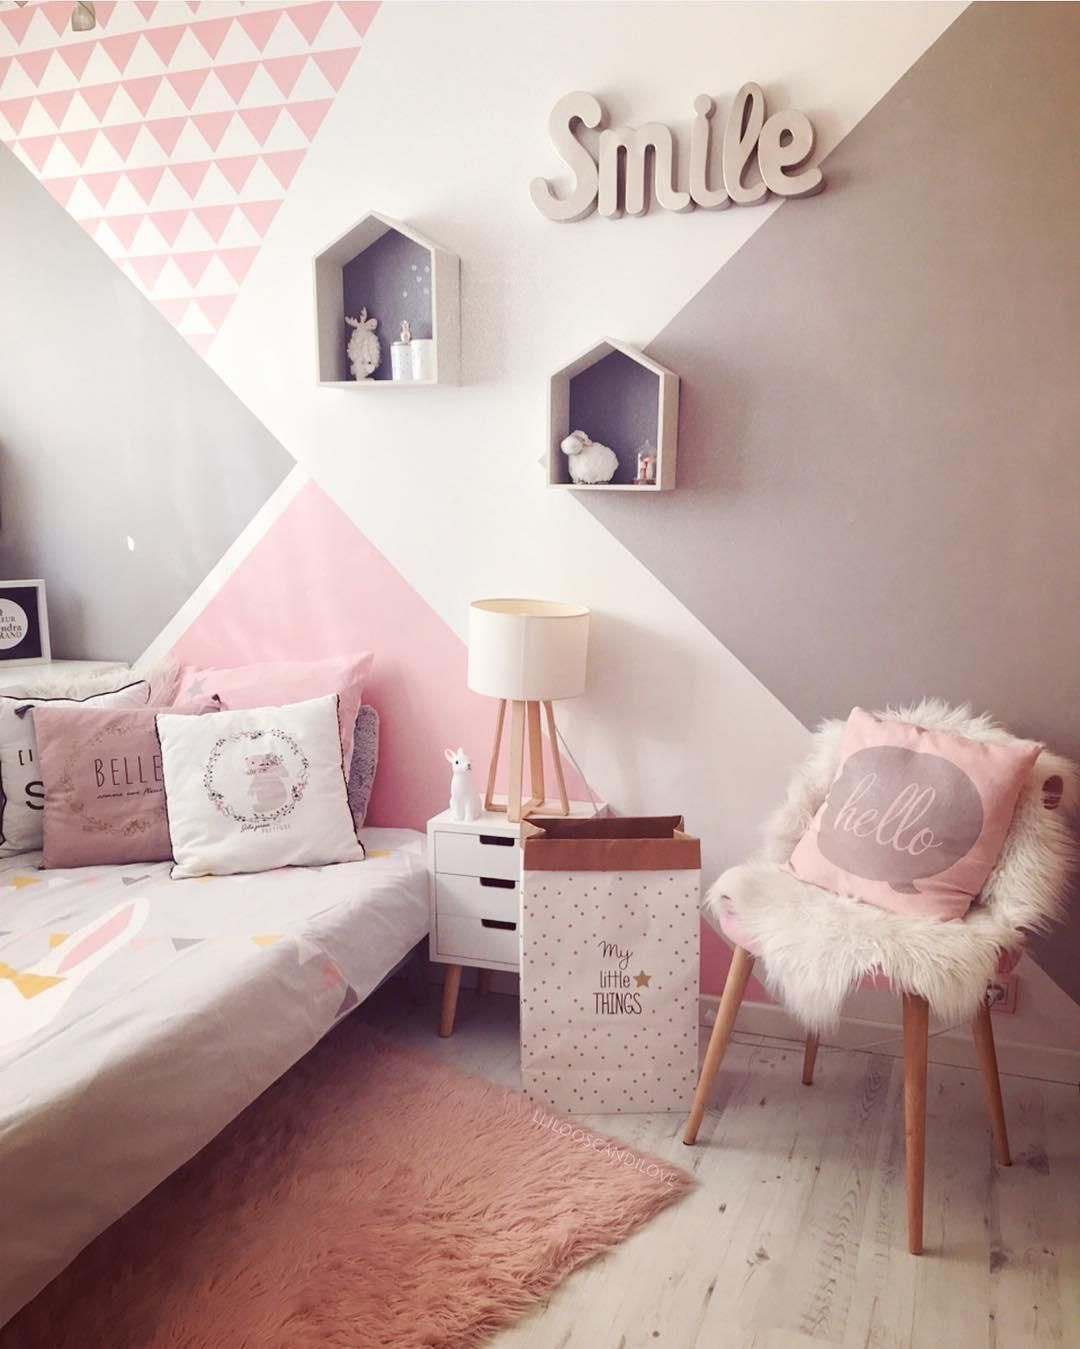 Schaffell Carry Wandfarbe Kinderzimmer Kinder Zimmer Deko Kinderzimmer Dekor